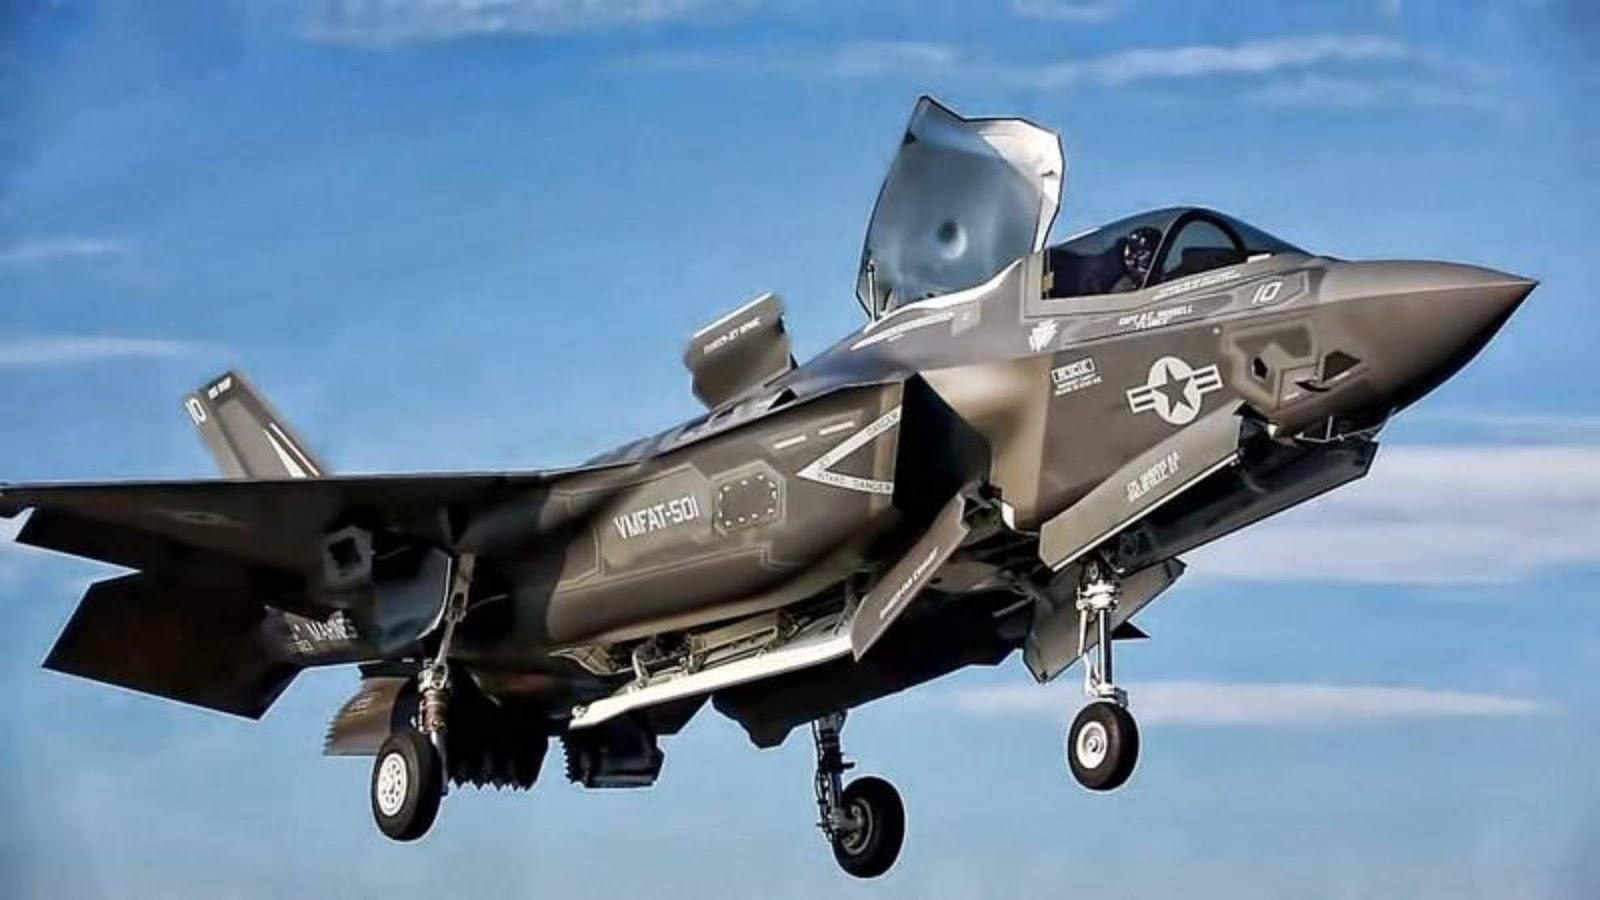 Inggris akan membeli 17 pesawat tempur F-35B baru